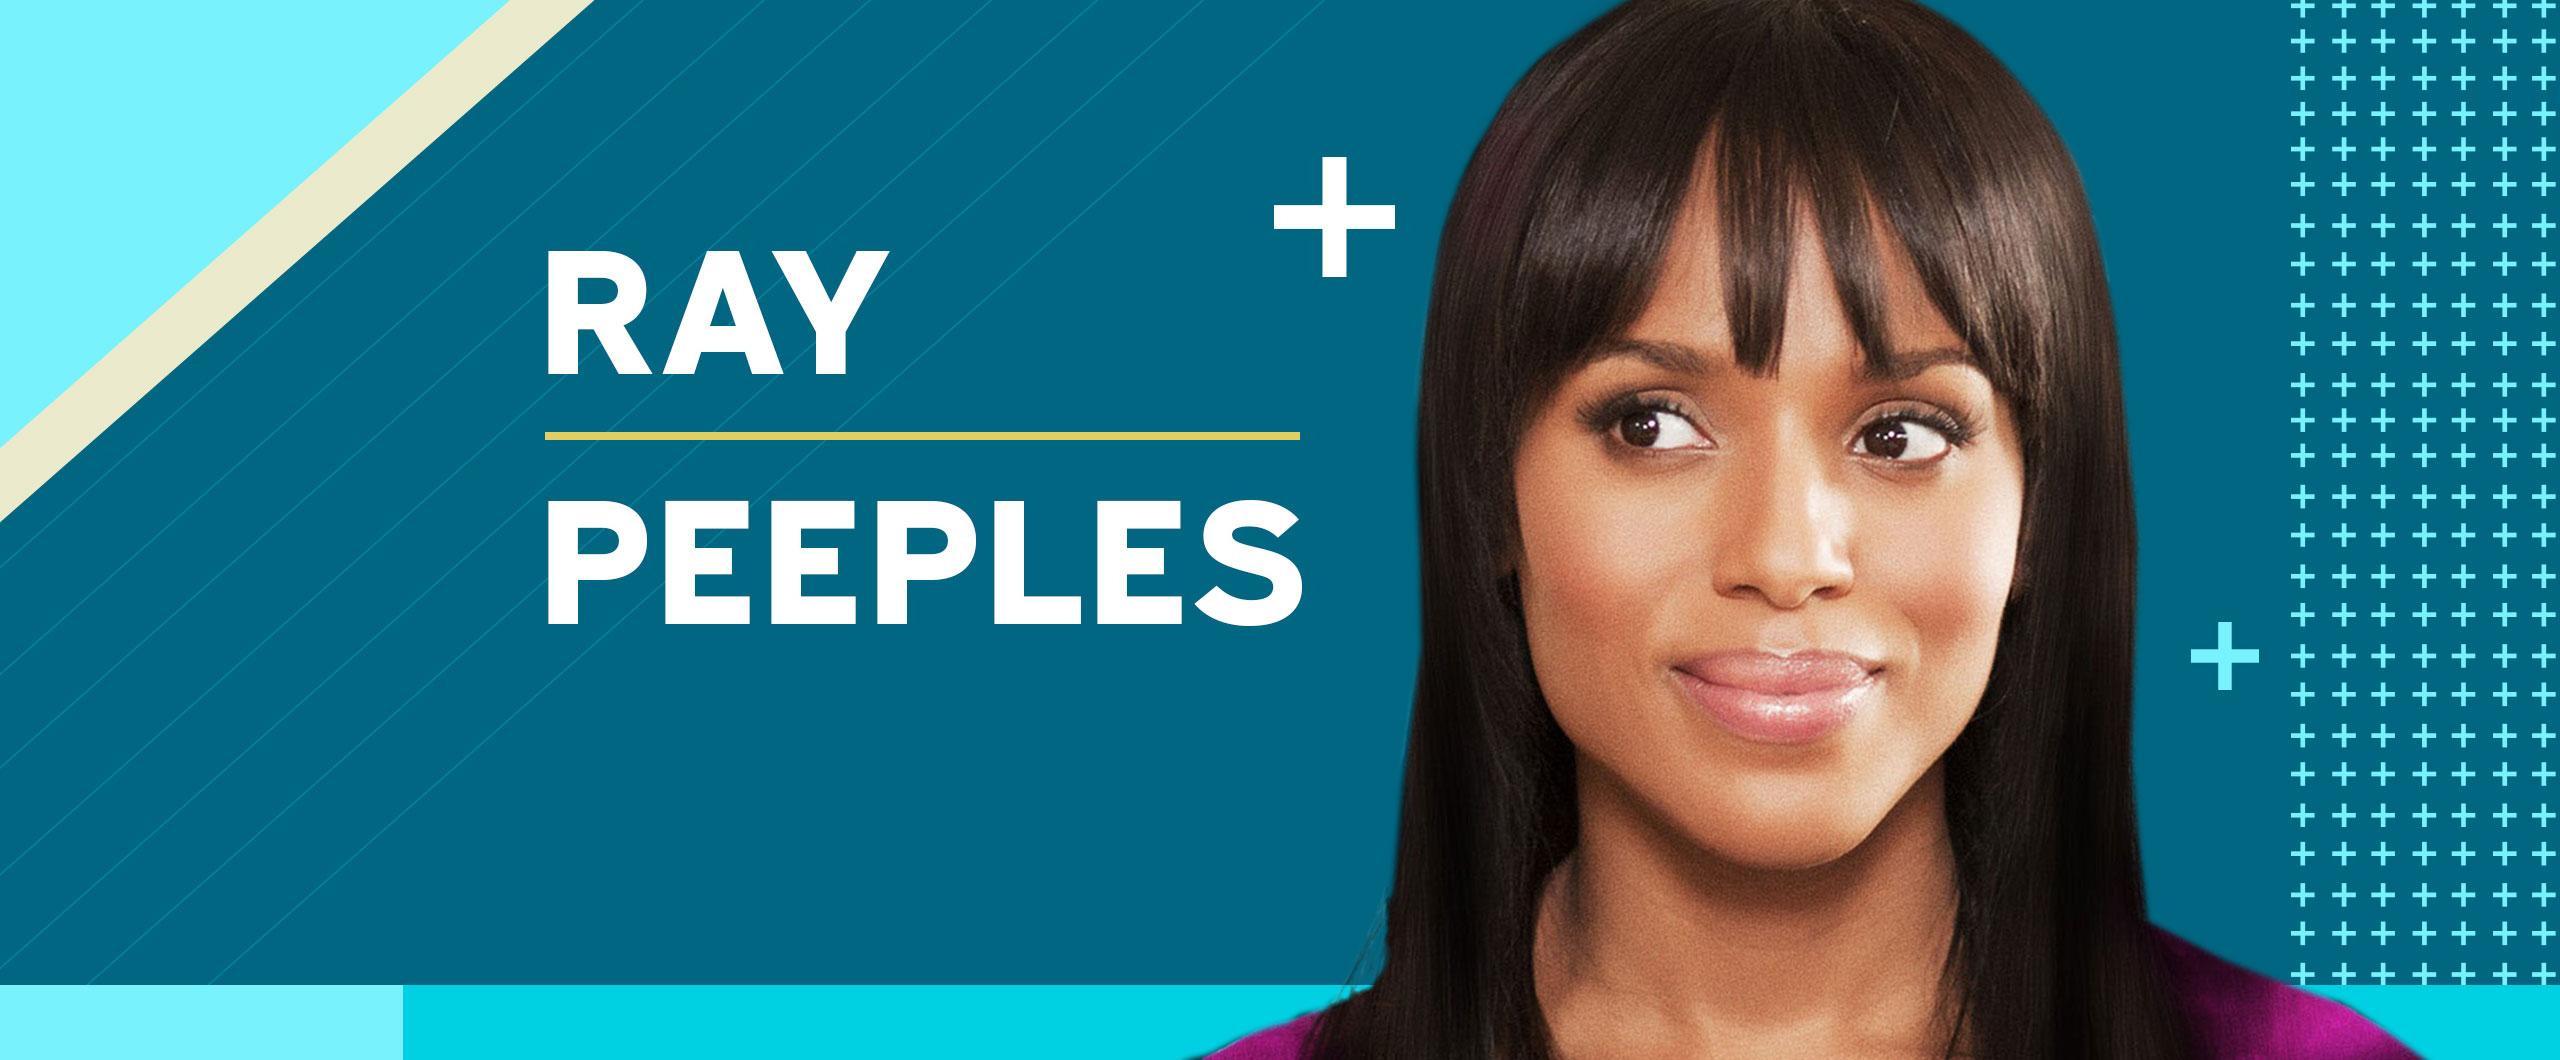 Kerry Washington Stunt_ Ray Peeples _ Tuesday